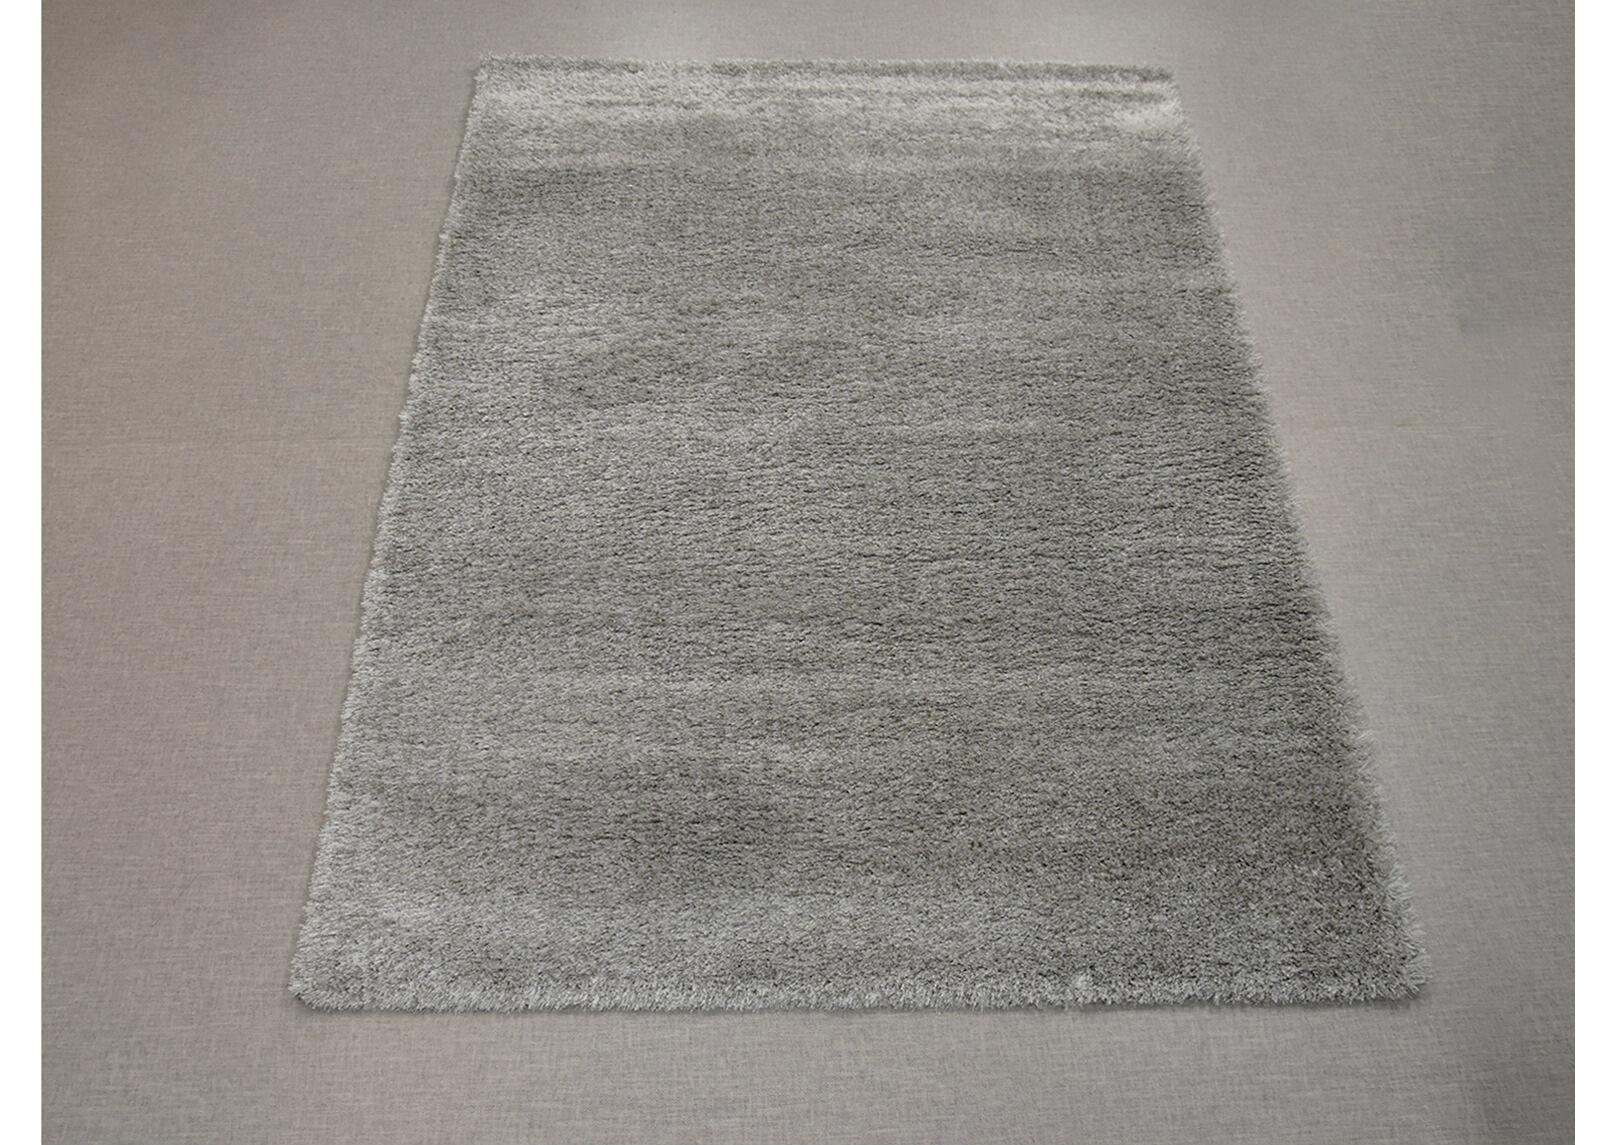 Moldabela Matto SHAGGY LAMA 200x300 cm